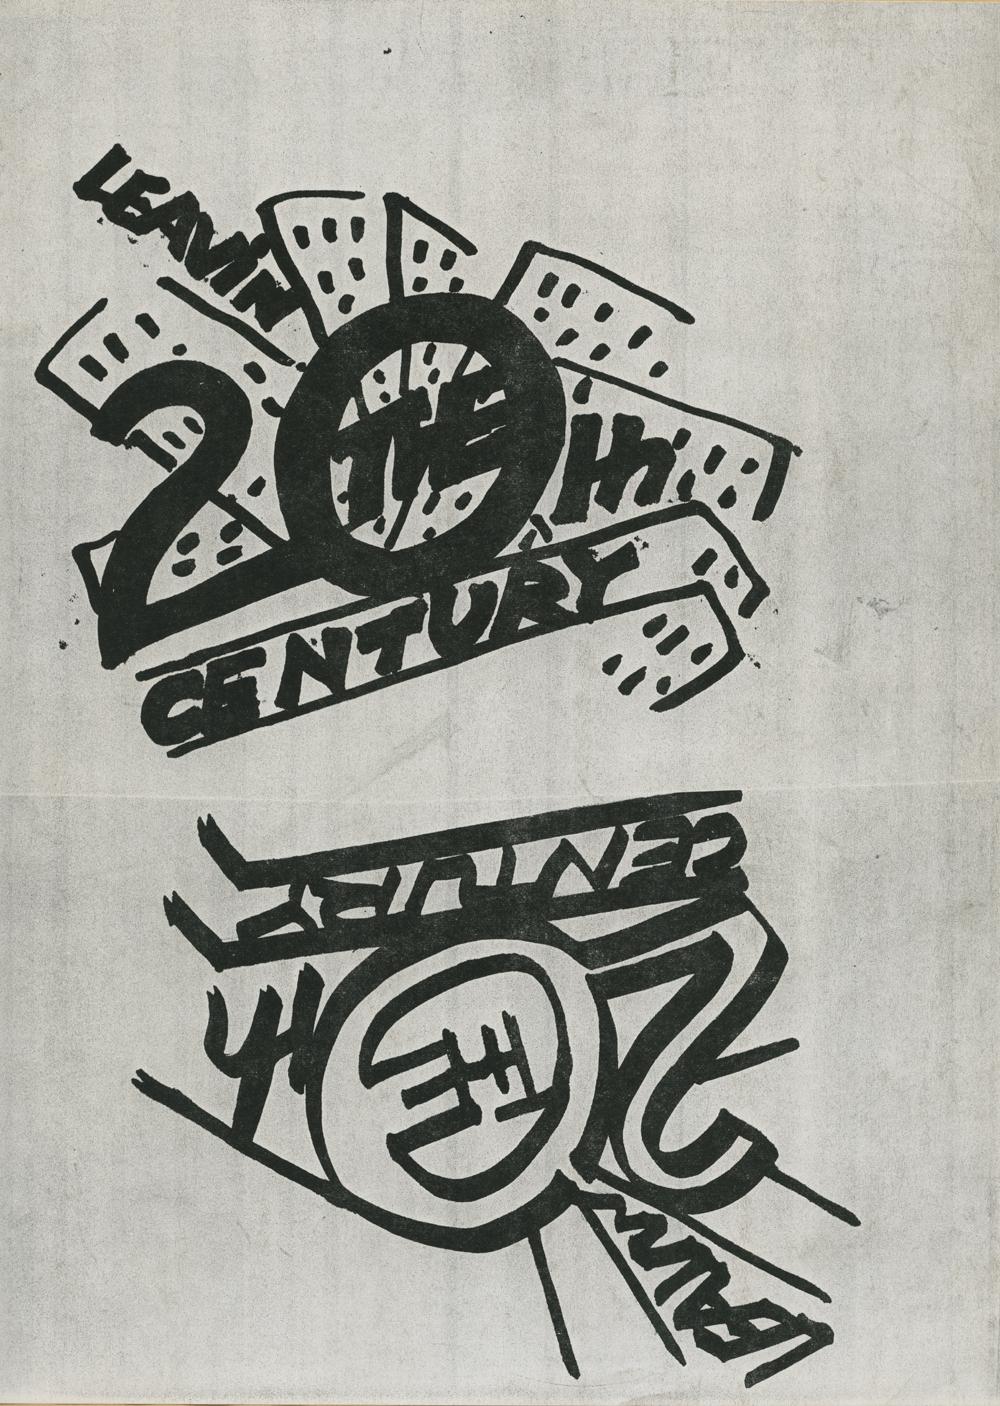 Paper_Scan_26_Paper_Design for magazine-logo_21x18cm_Xerox-copy_1979